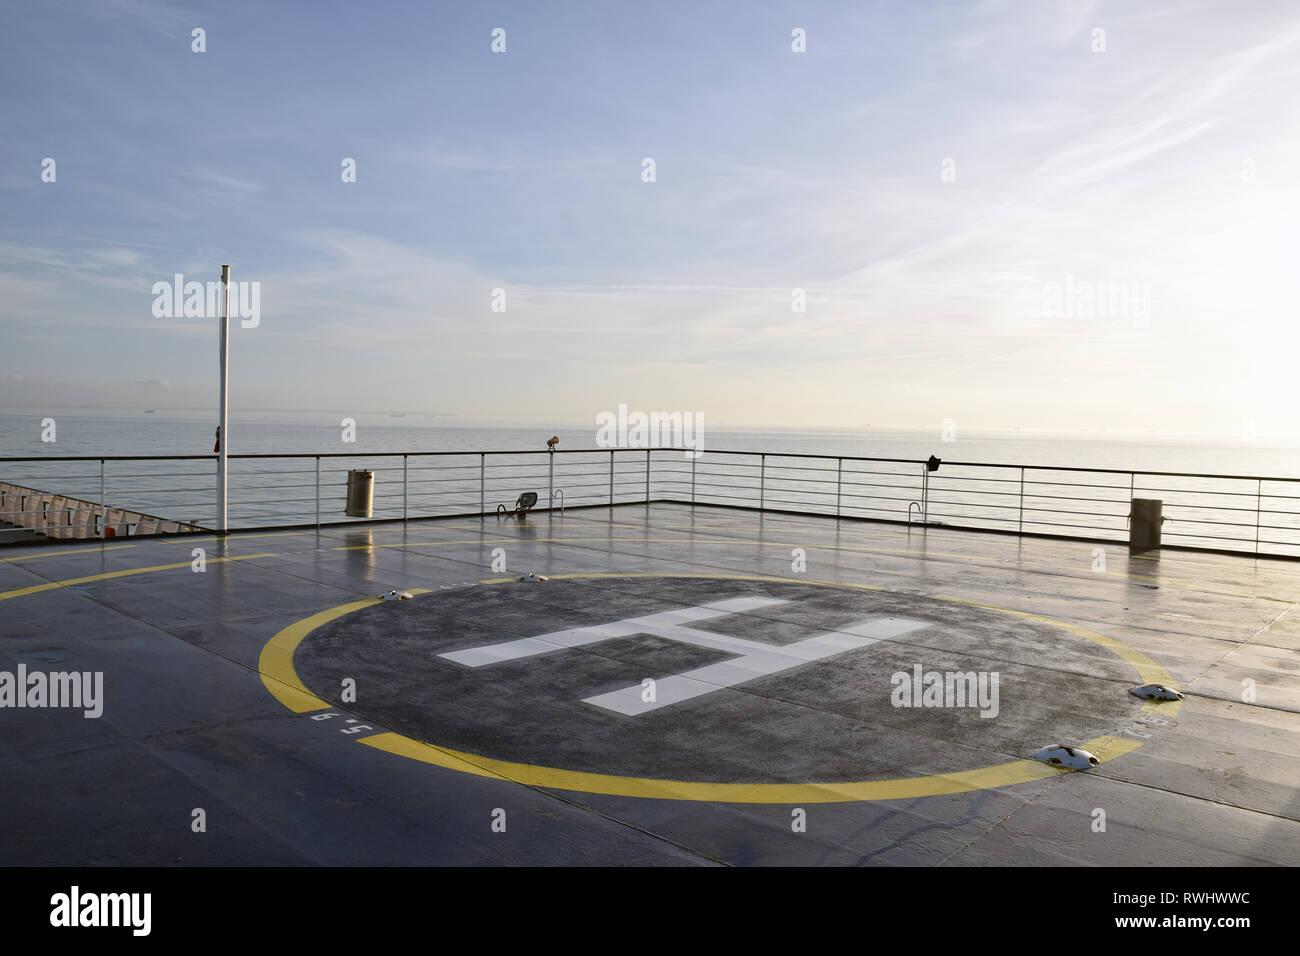 Helipad on Britanny Ferries boat, Feb 2019 - Stock Image